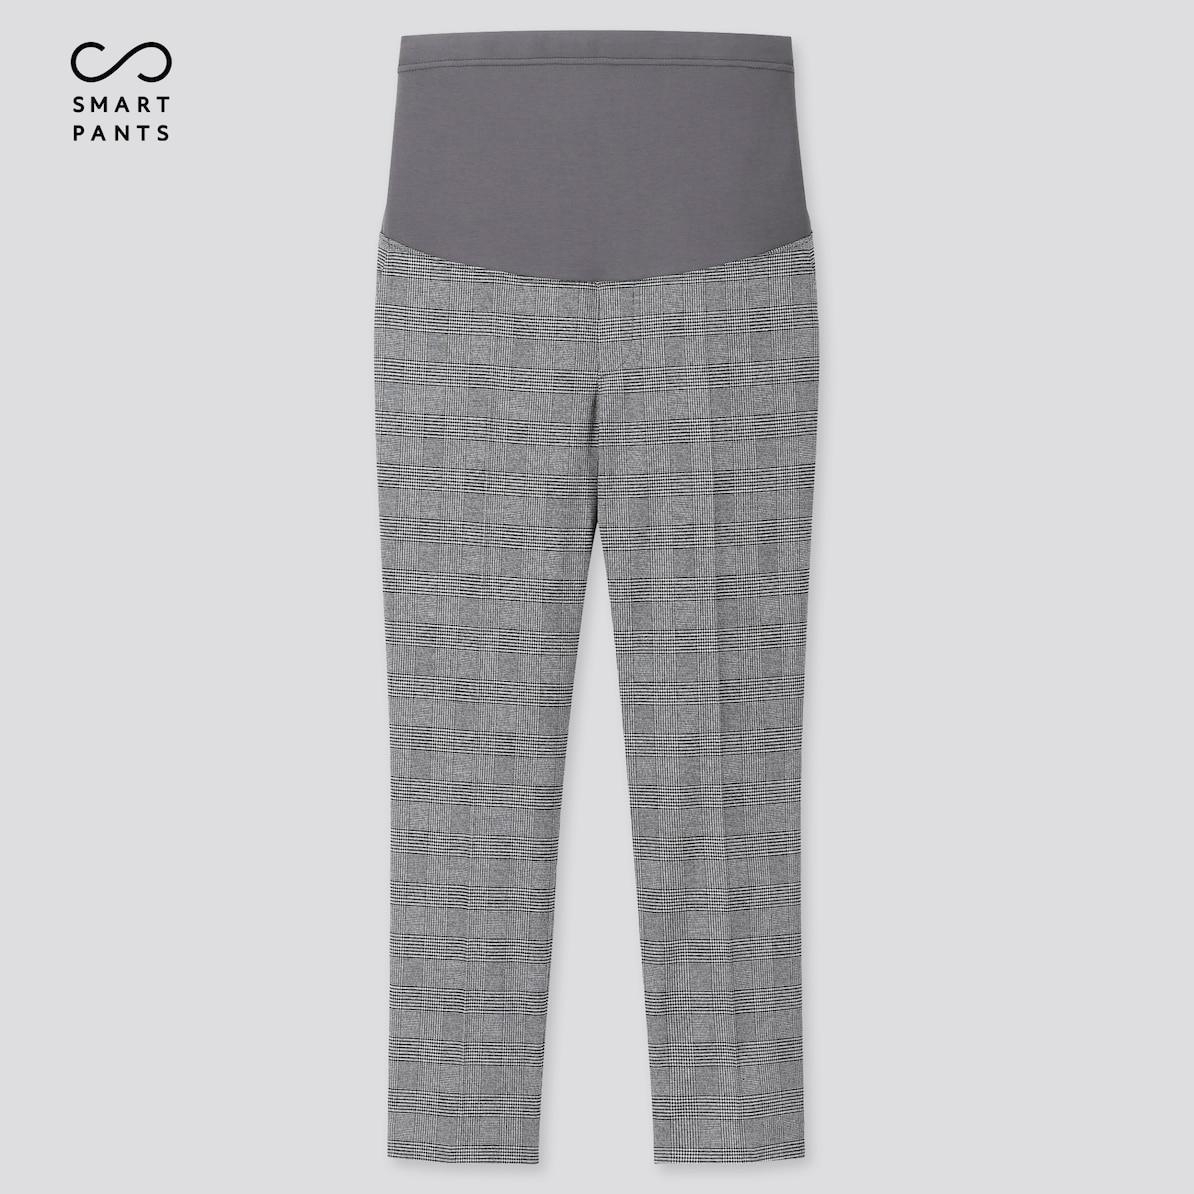 https://www.uniqlo.com/jp/store/goods/422301-06